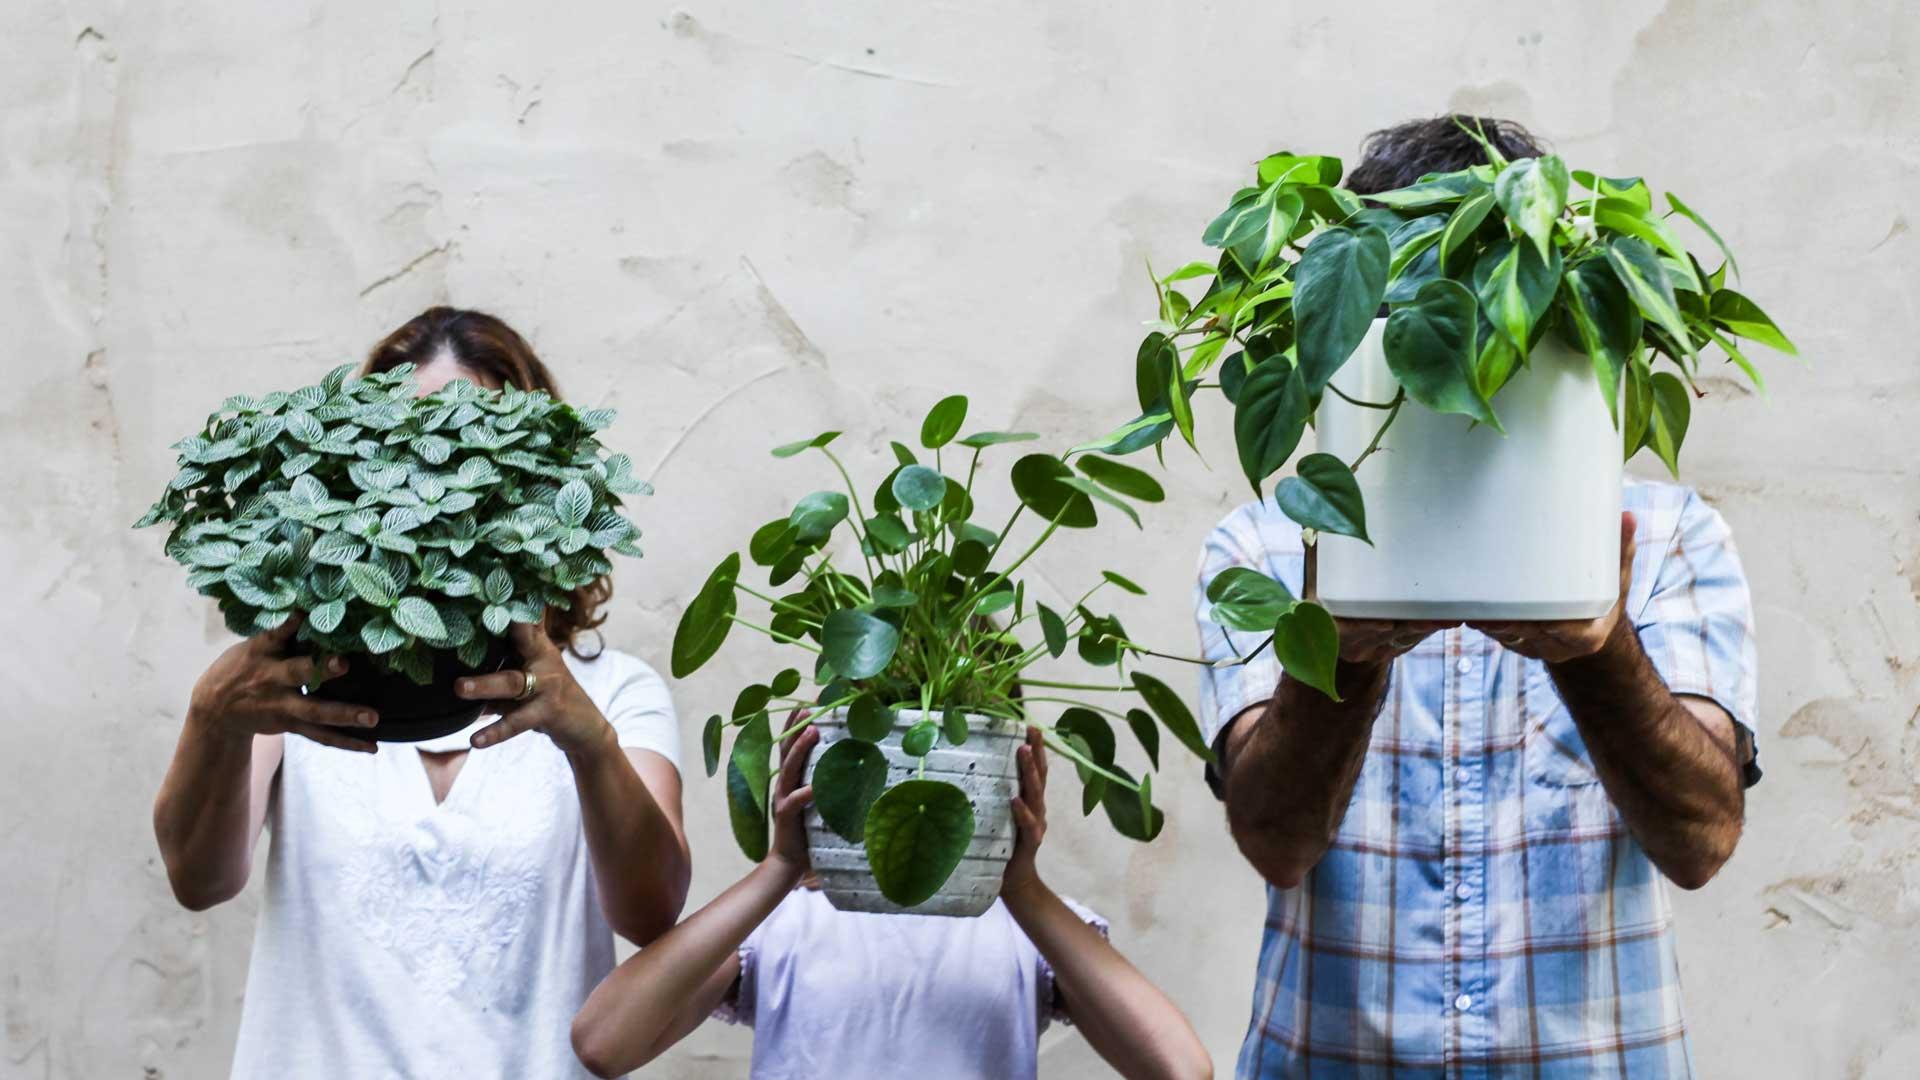 Holding Good Dirt house plants